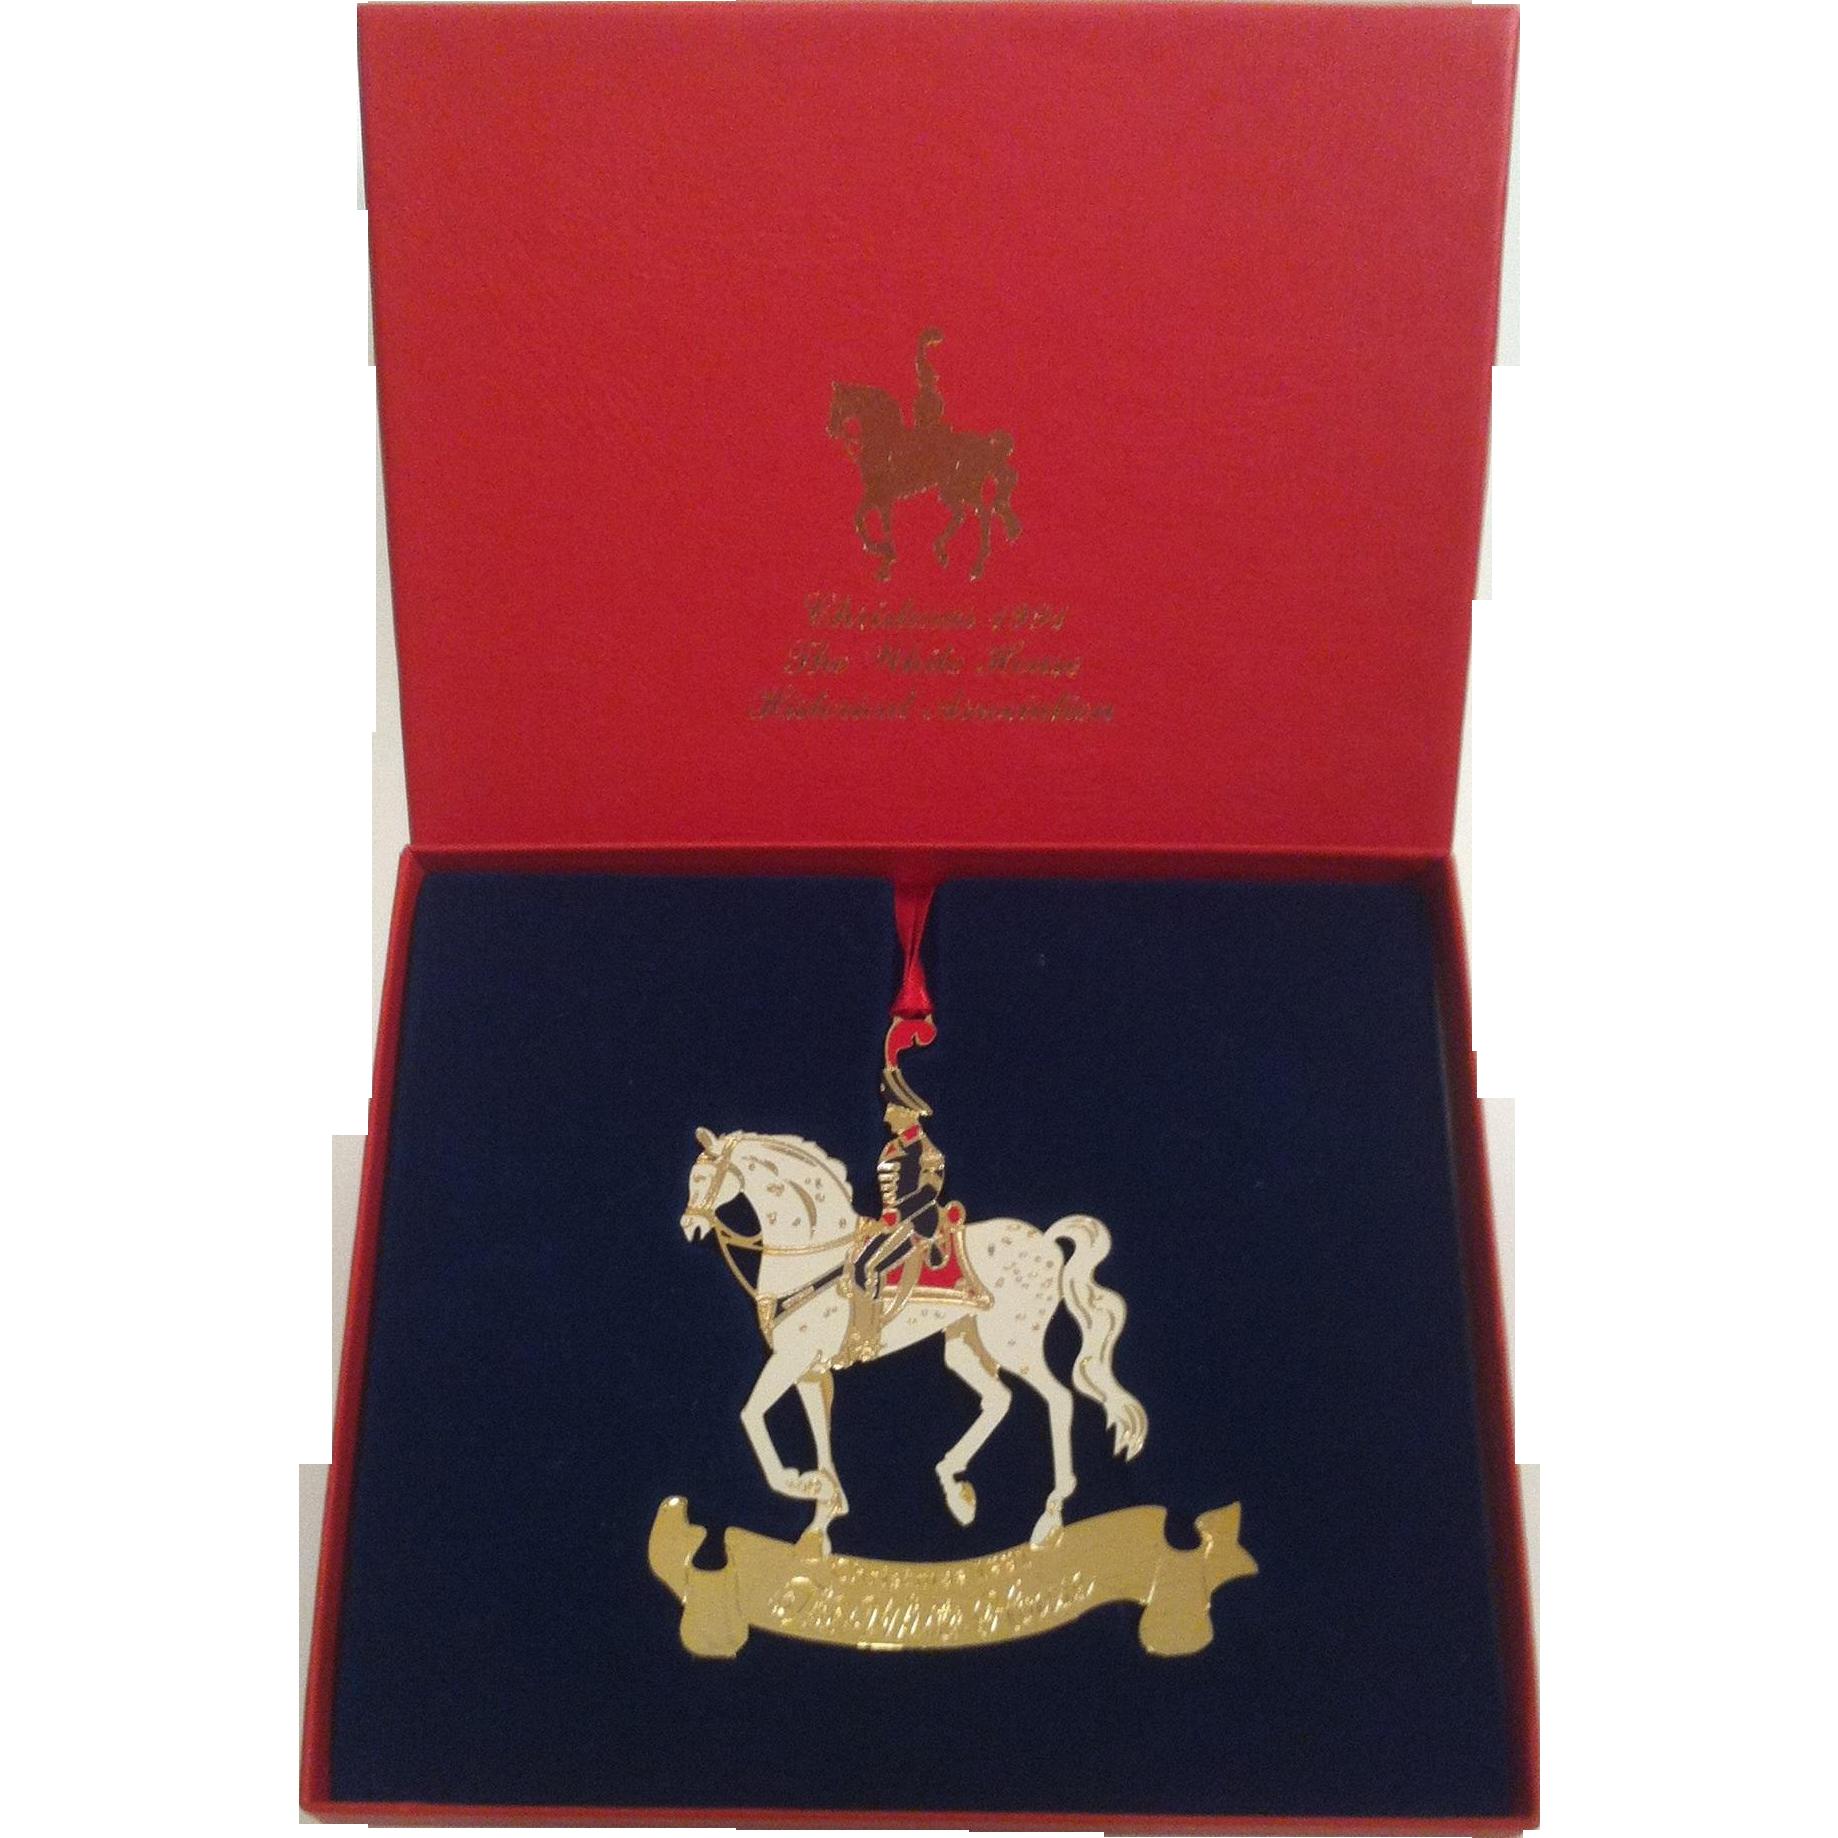 1991 White House Ornament ~ William Henry Harrison